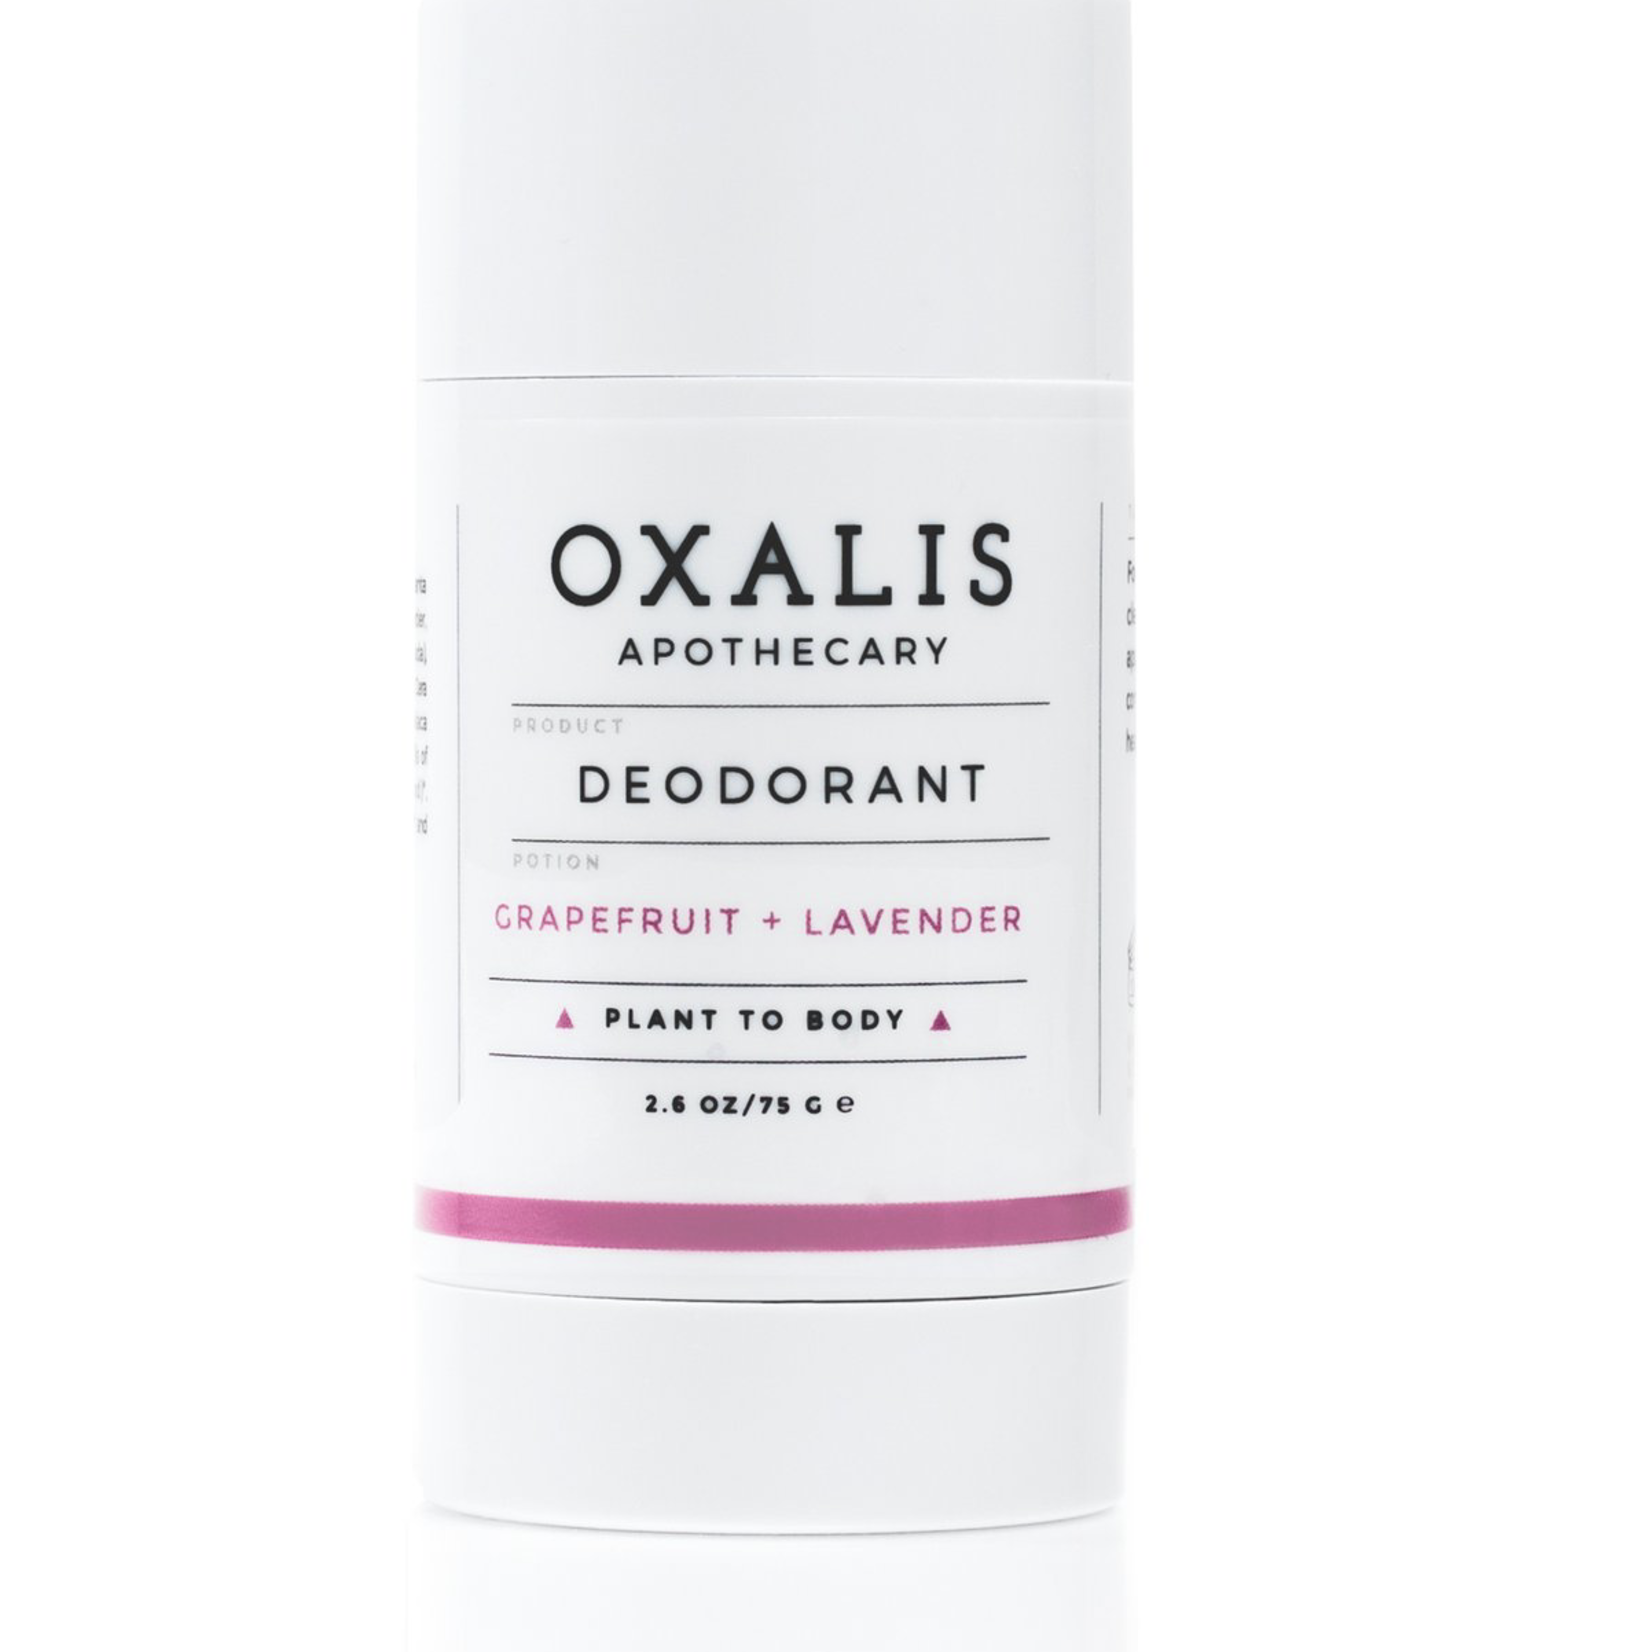 Oxalis Apothecary Grapefruit + Lavender Deodorant